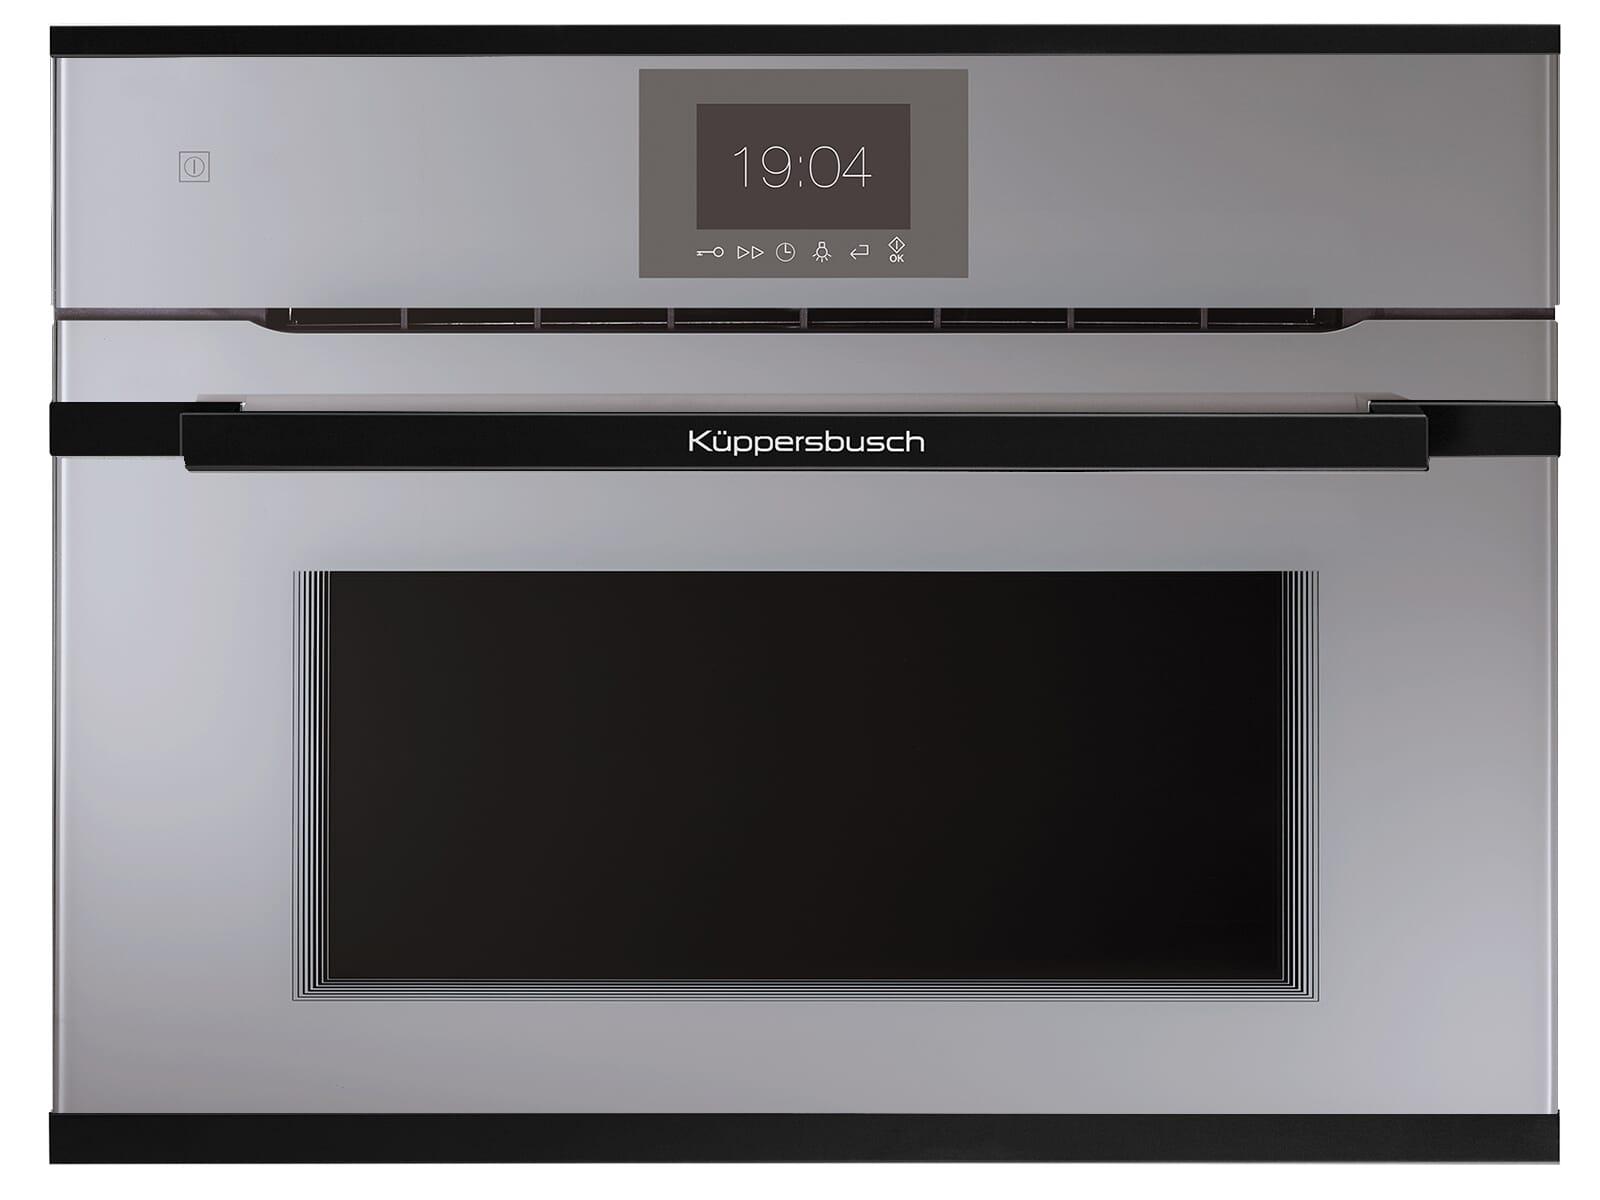 Küppersbusch CBM 6550.0 G5 K-Series. 5 Compact Backofen mit Mikrowelle Grau/Black Velvet